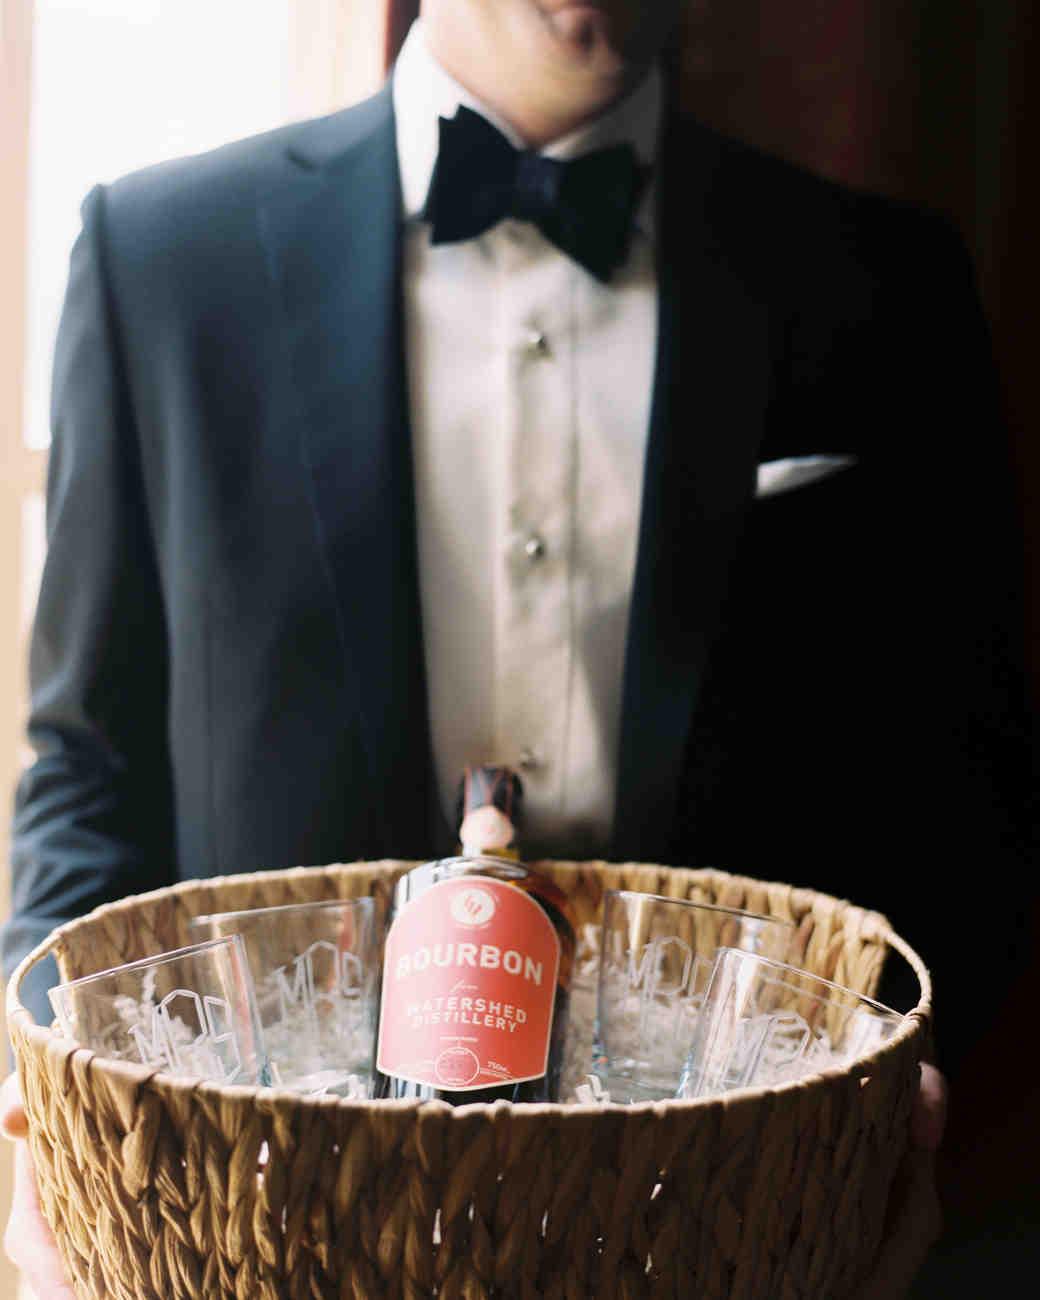 taylor-john-wedding-bourbon-98-s112507-0116.jpg